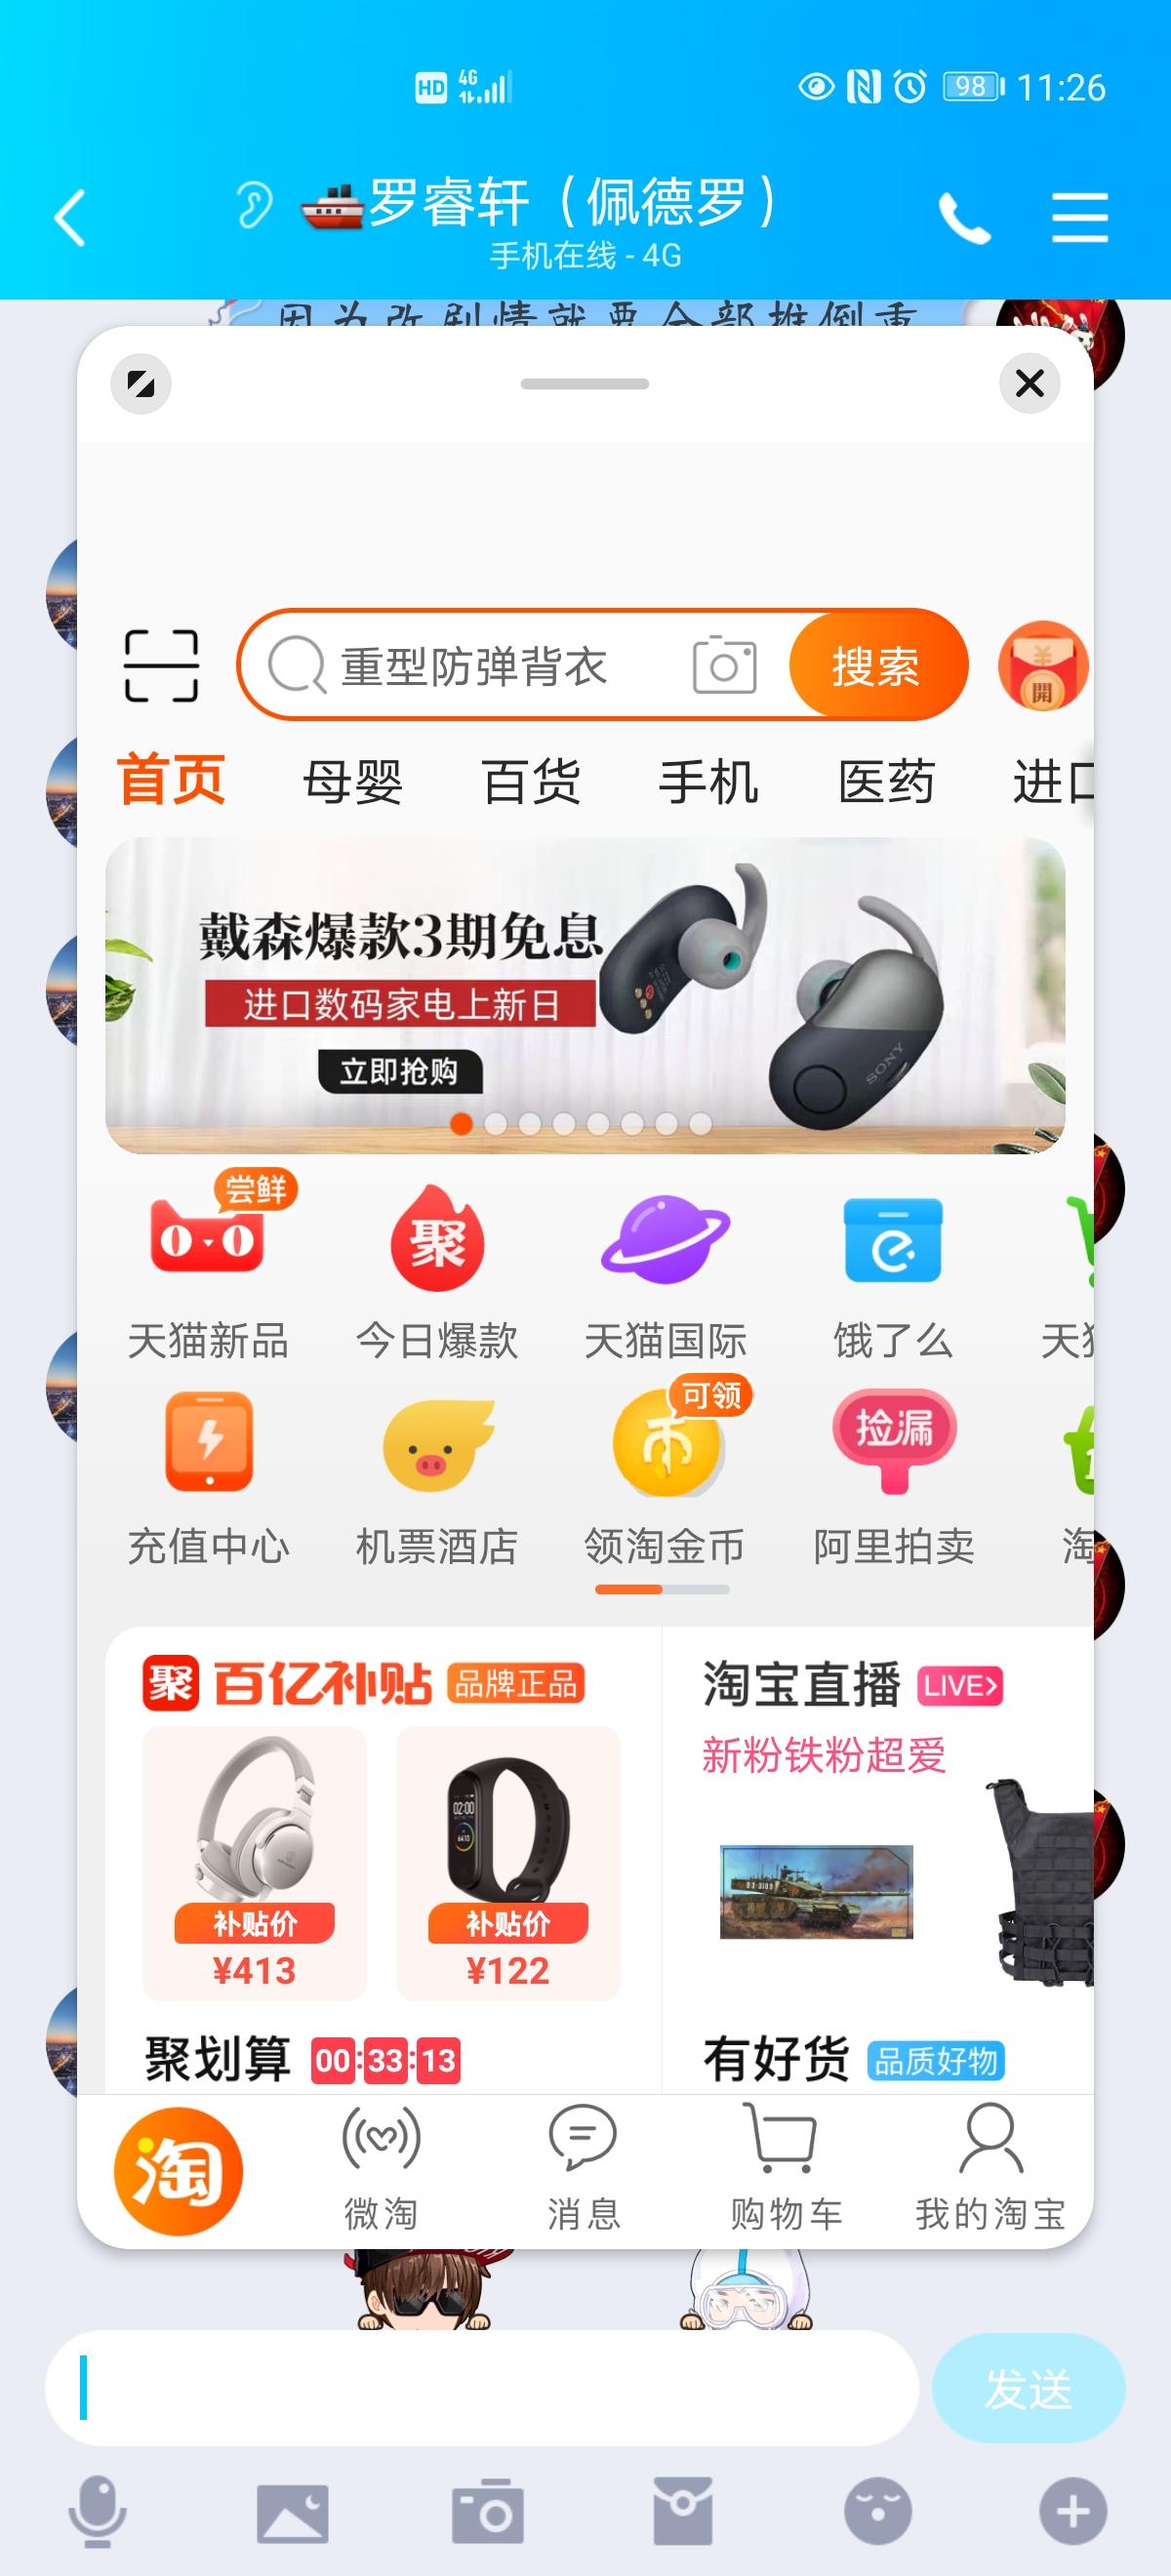 Screenshot_20200512_232645_com.taobao.taobao.jpg